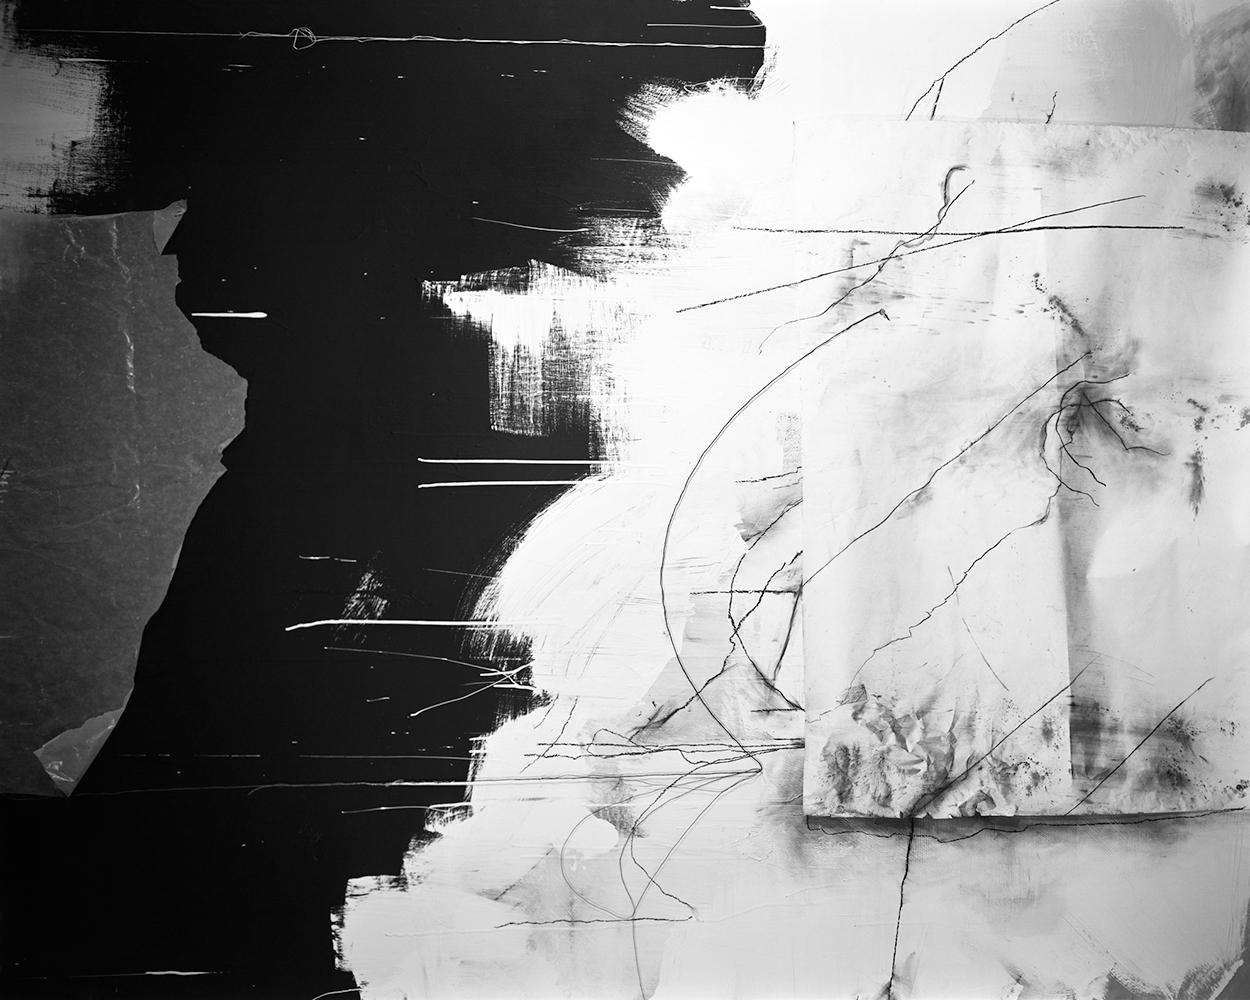 Lauren Semivan,  Pitch,  2014. Archival pigment print.